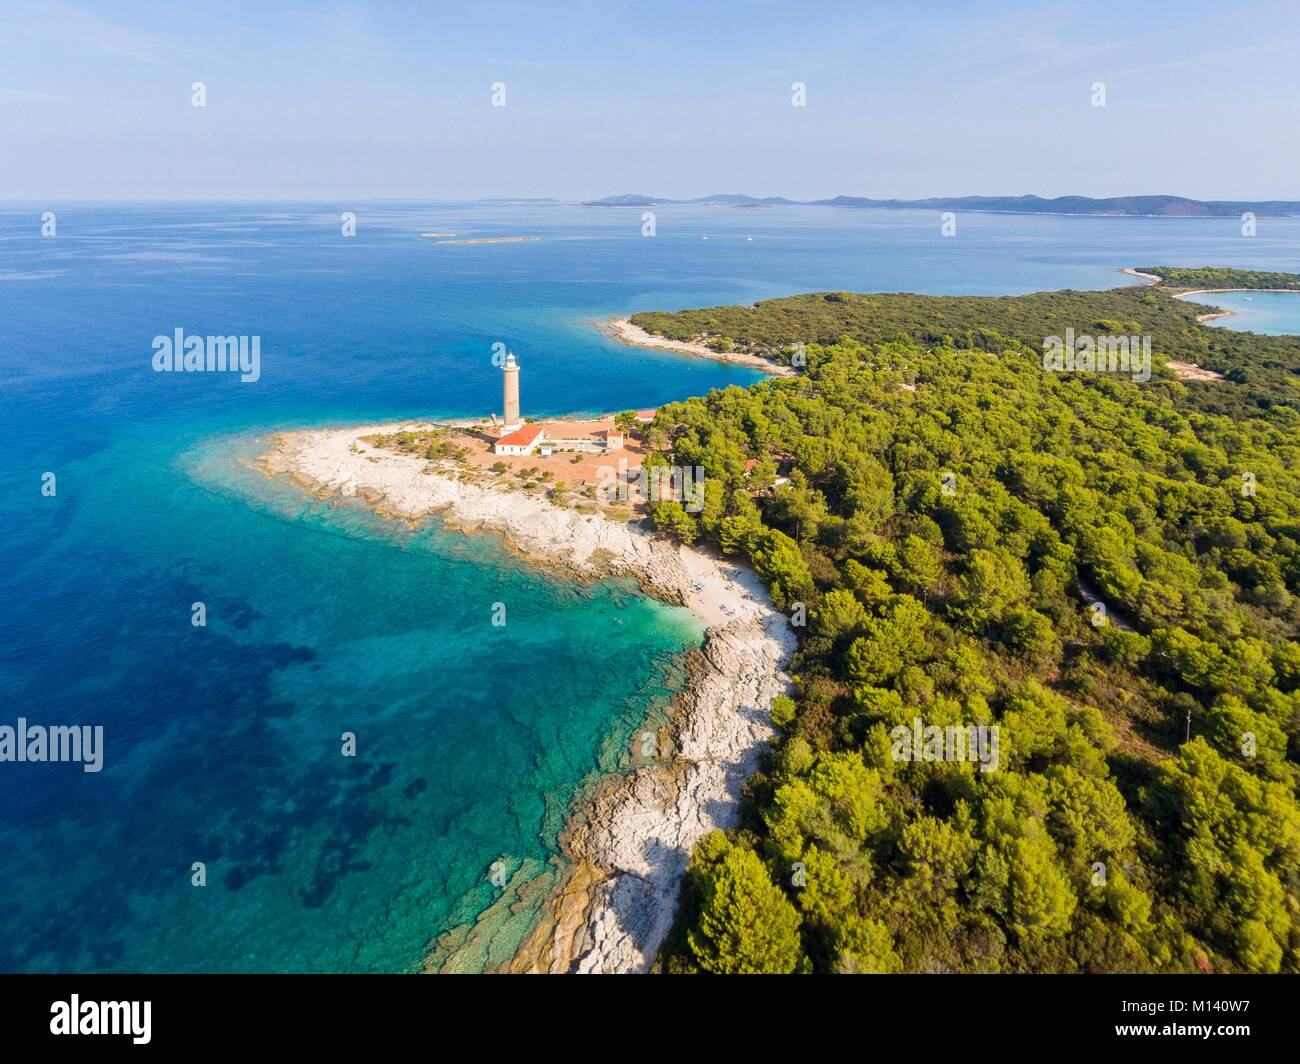 Croatia, North Dalmatia, Dalmatian coast, Zadar archipelago, Dugi Otok Island, Veli Rat lighthouse (aerial view) - Stock Image